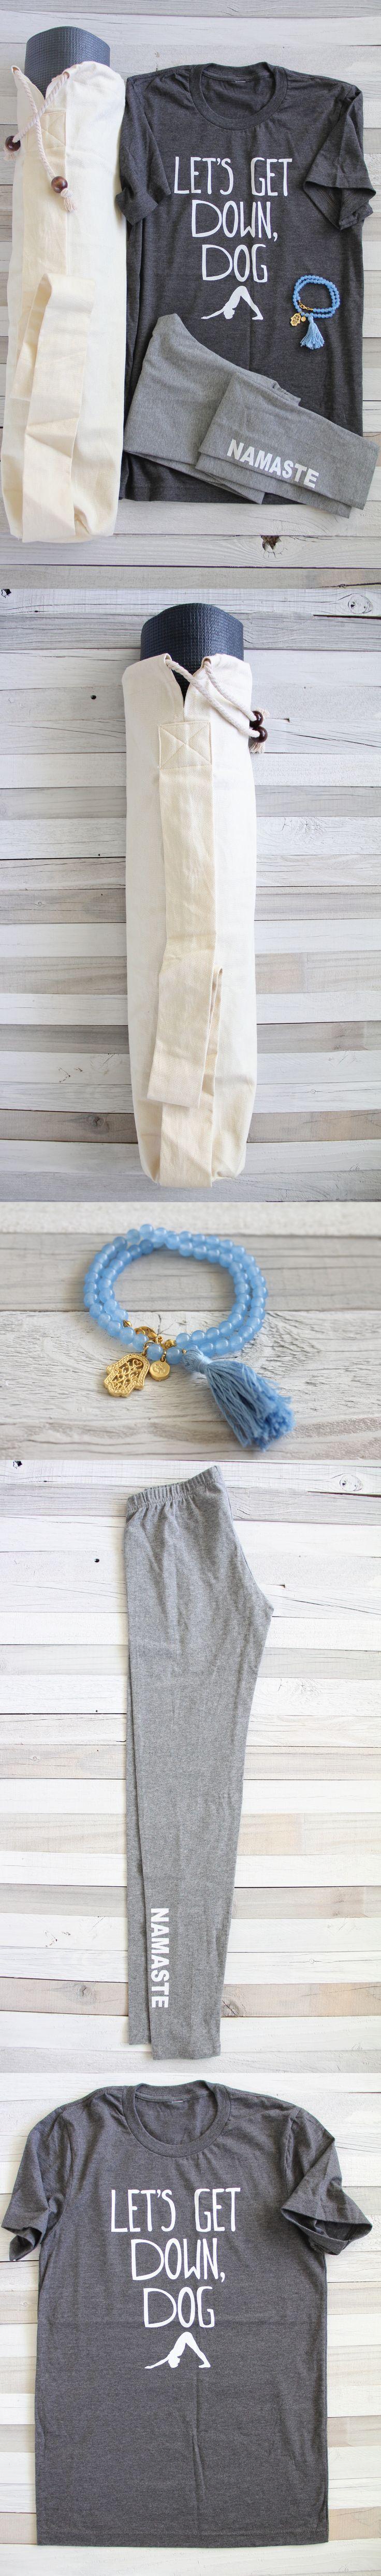 Yoga Gift Set! Includes: Yoga mat bag, yoga shirt, yoga leggings, and a yoga hamsa bracelet! Click picture to buy it now! Yoga Apparel   Yoga Clothes   Yoga Accessories